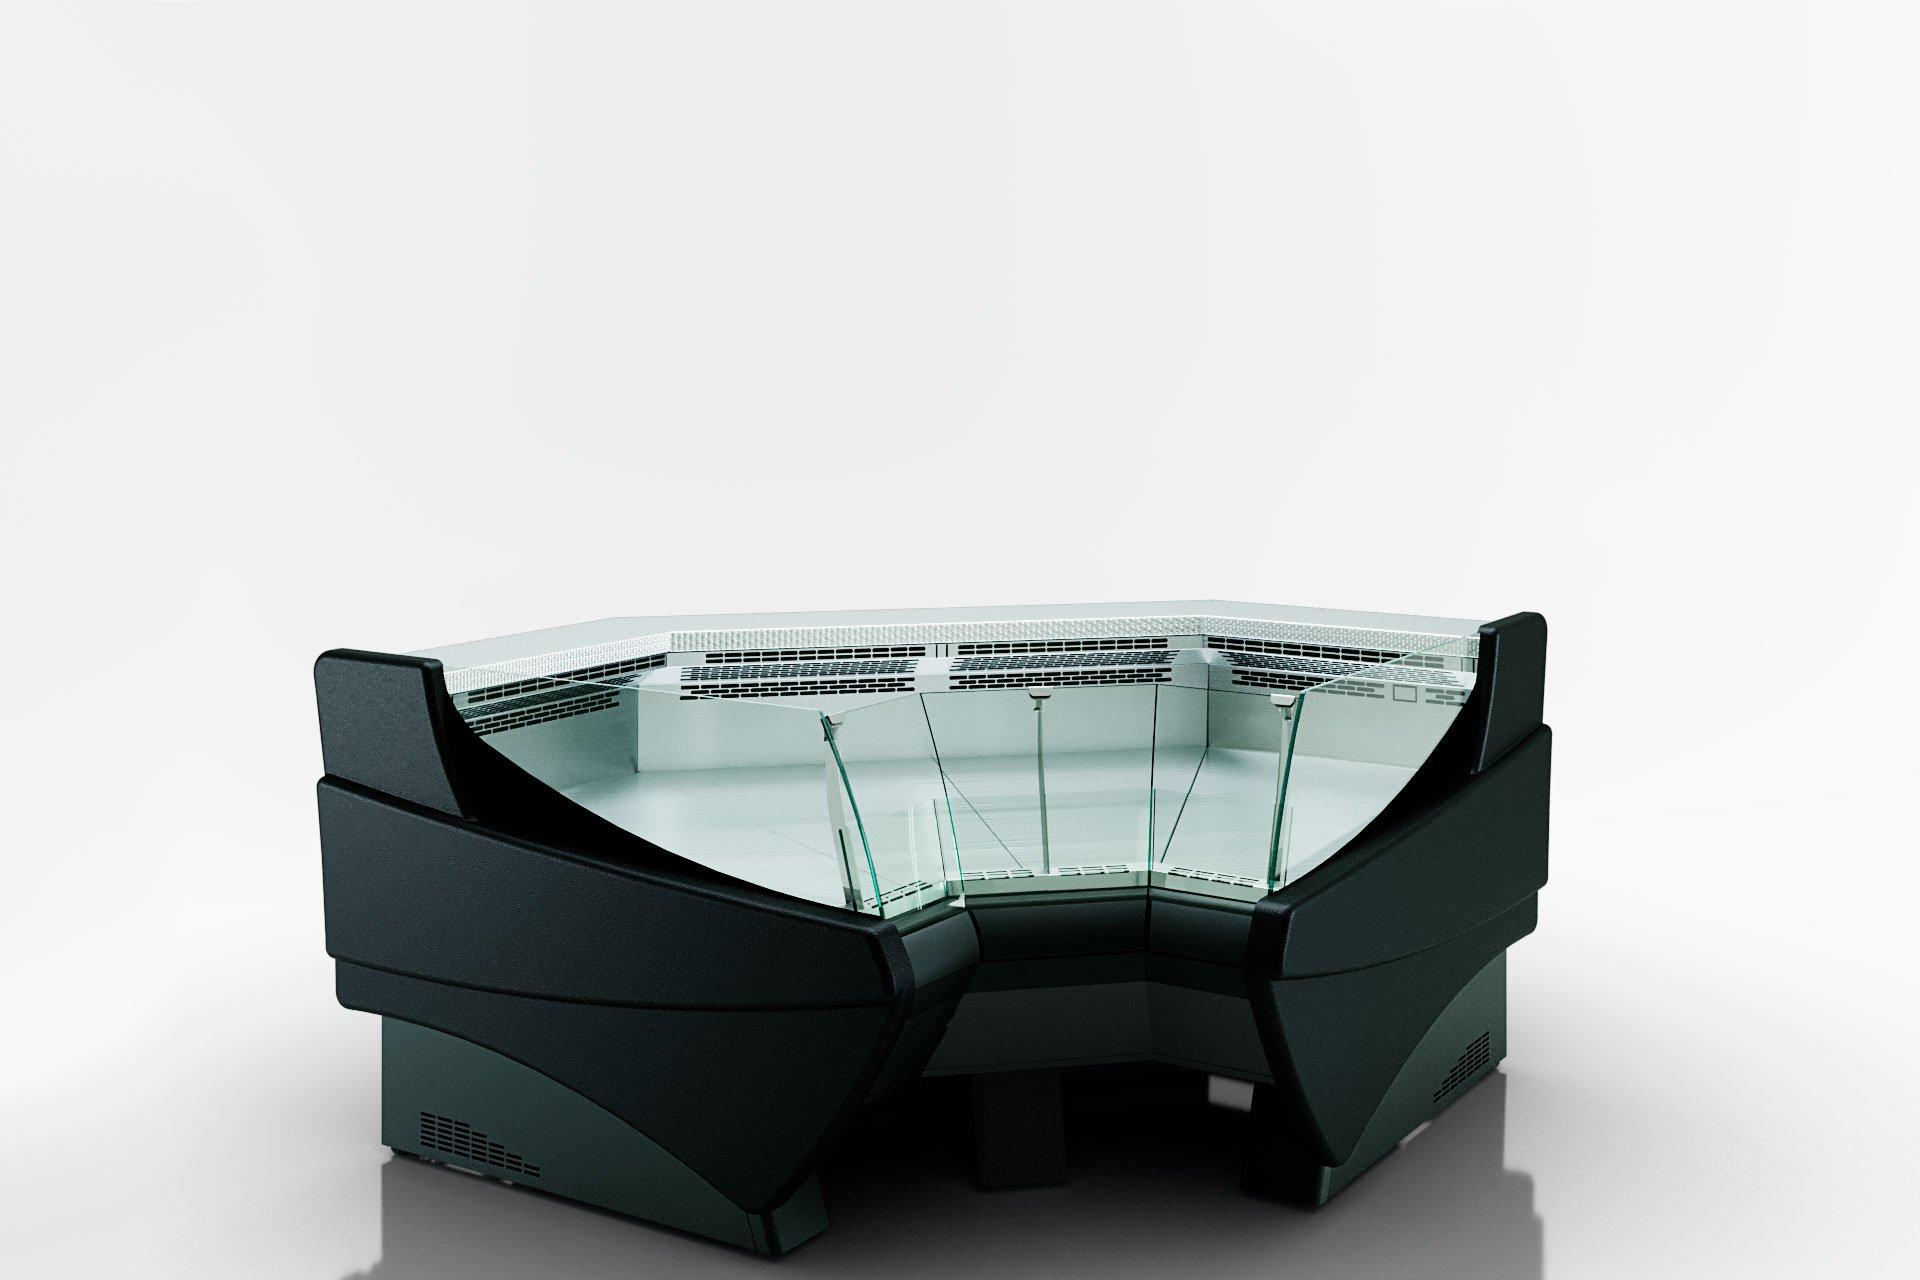 Вітрина Symphony luxe MG 120 deli self 085-DLM-IS90